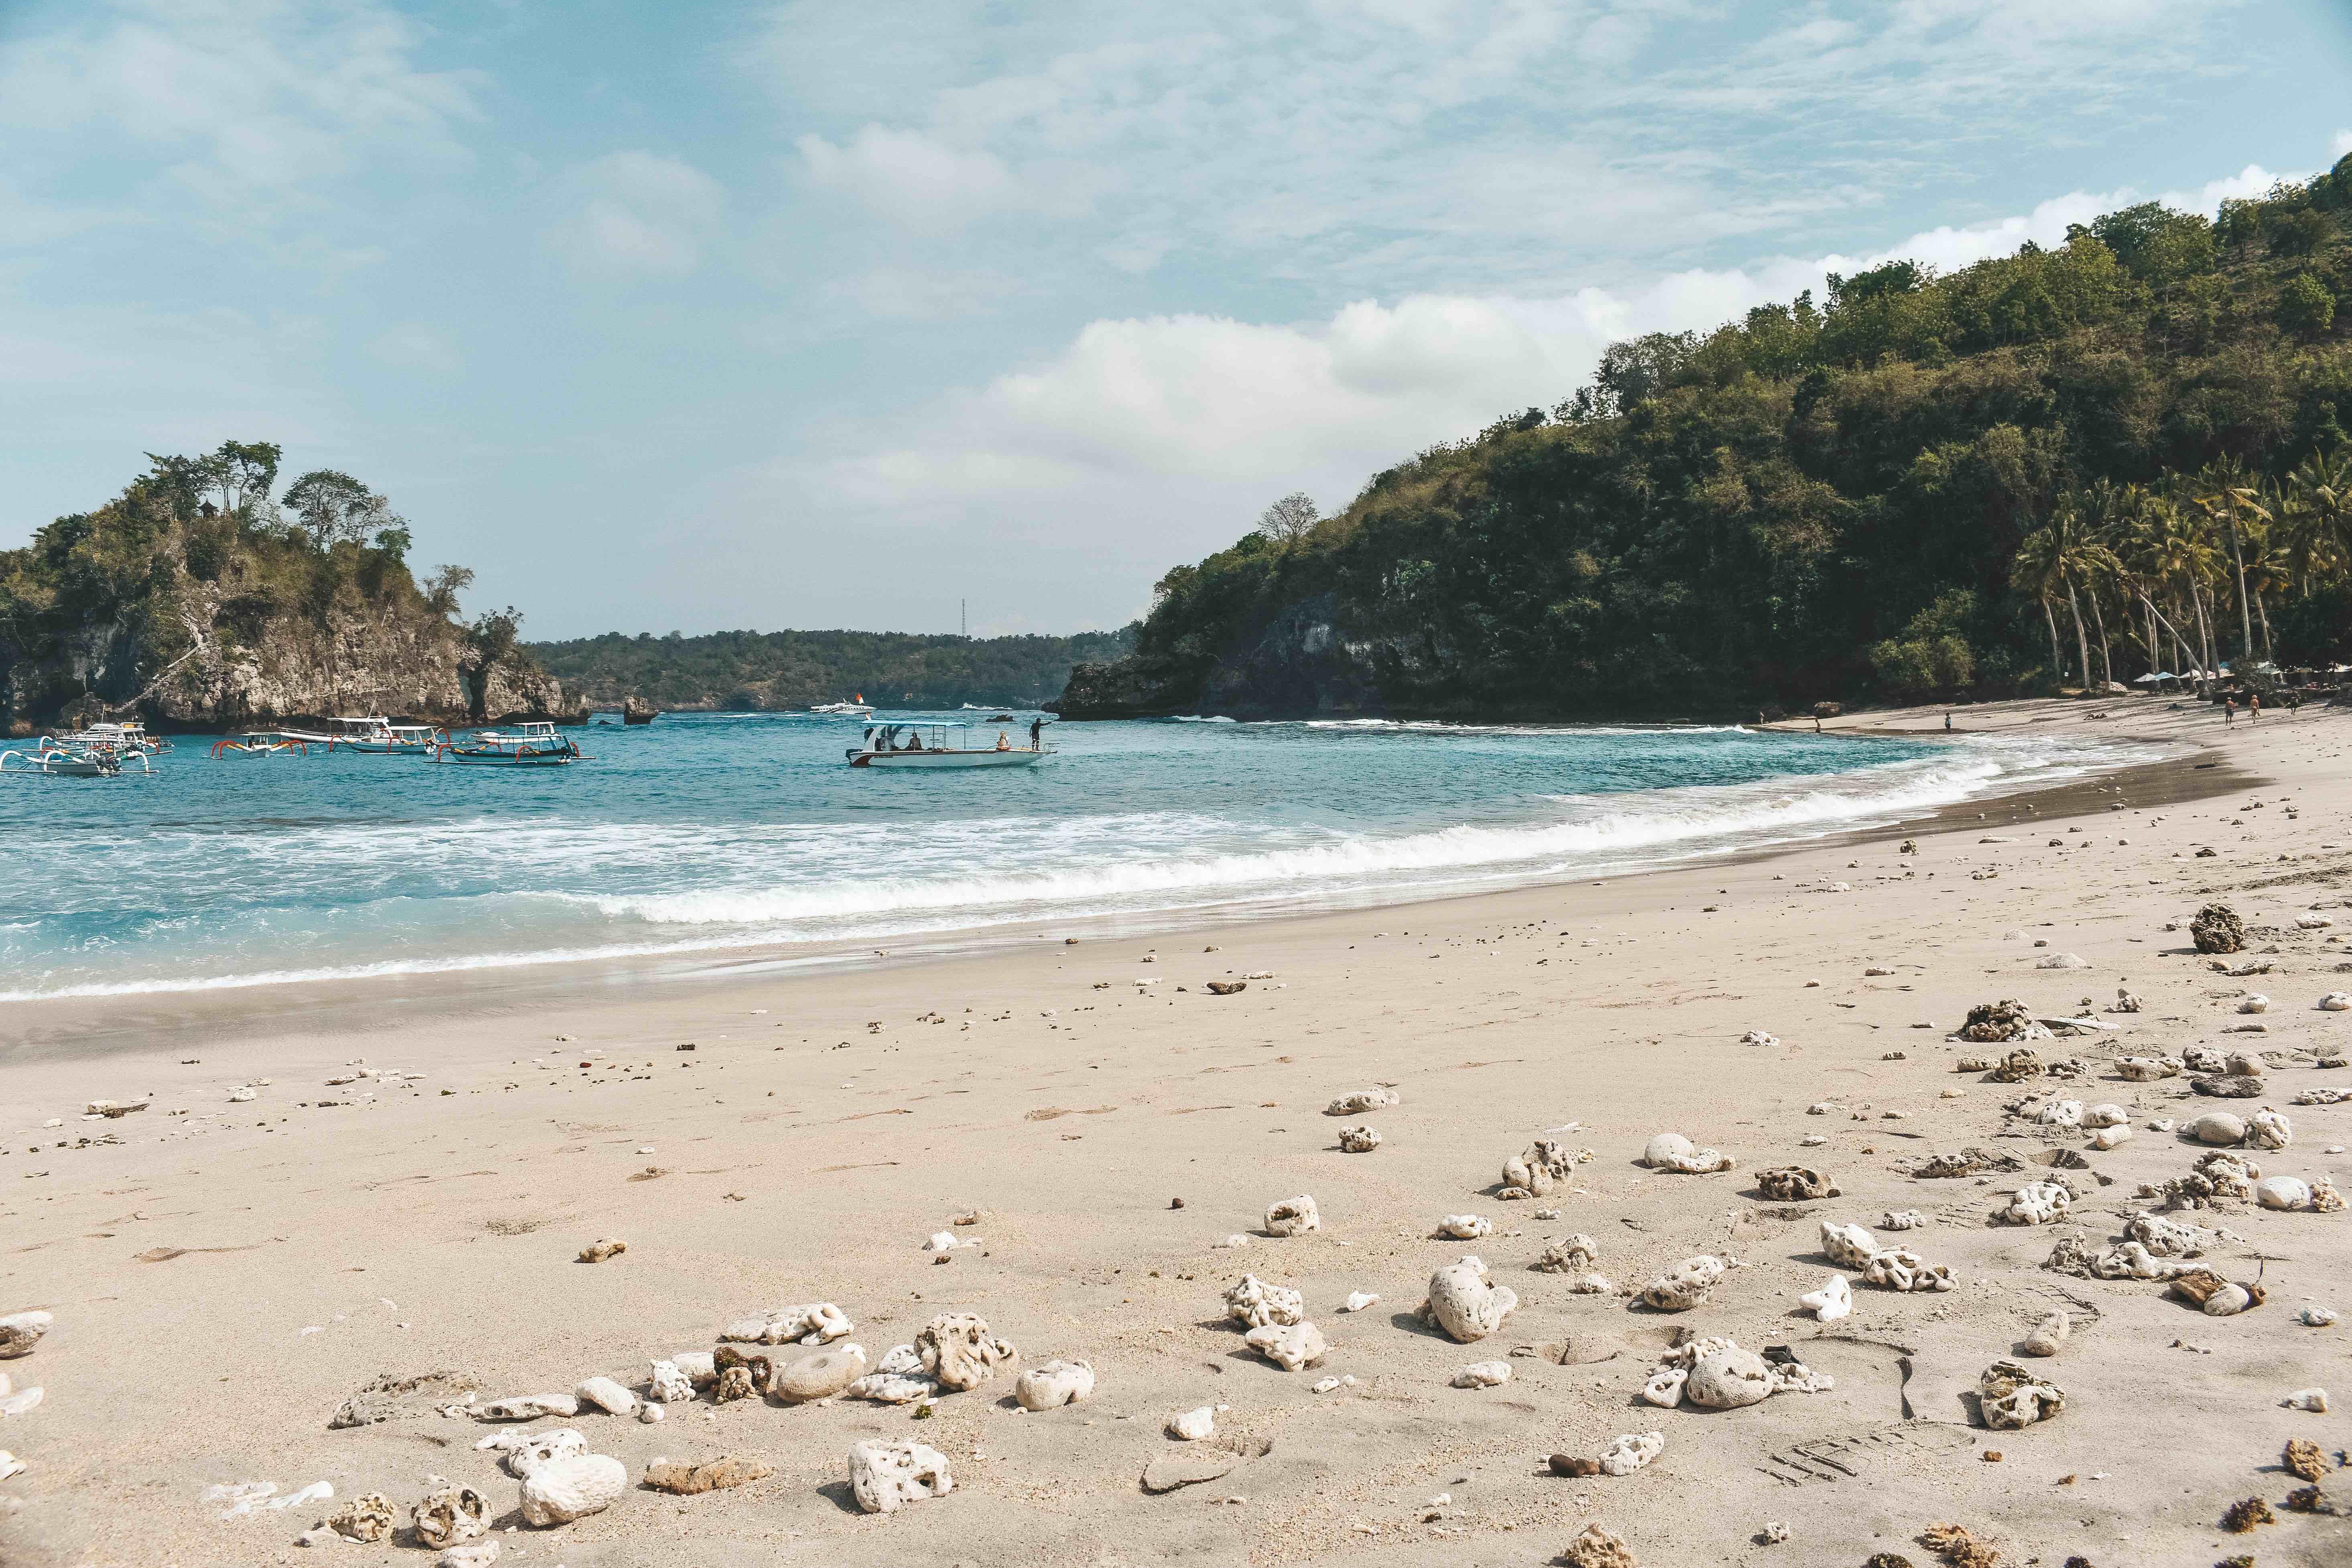 How to get to Nusa Penida